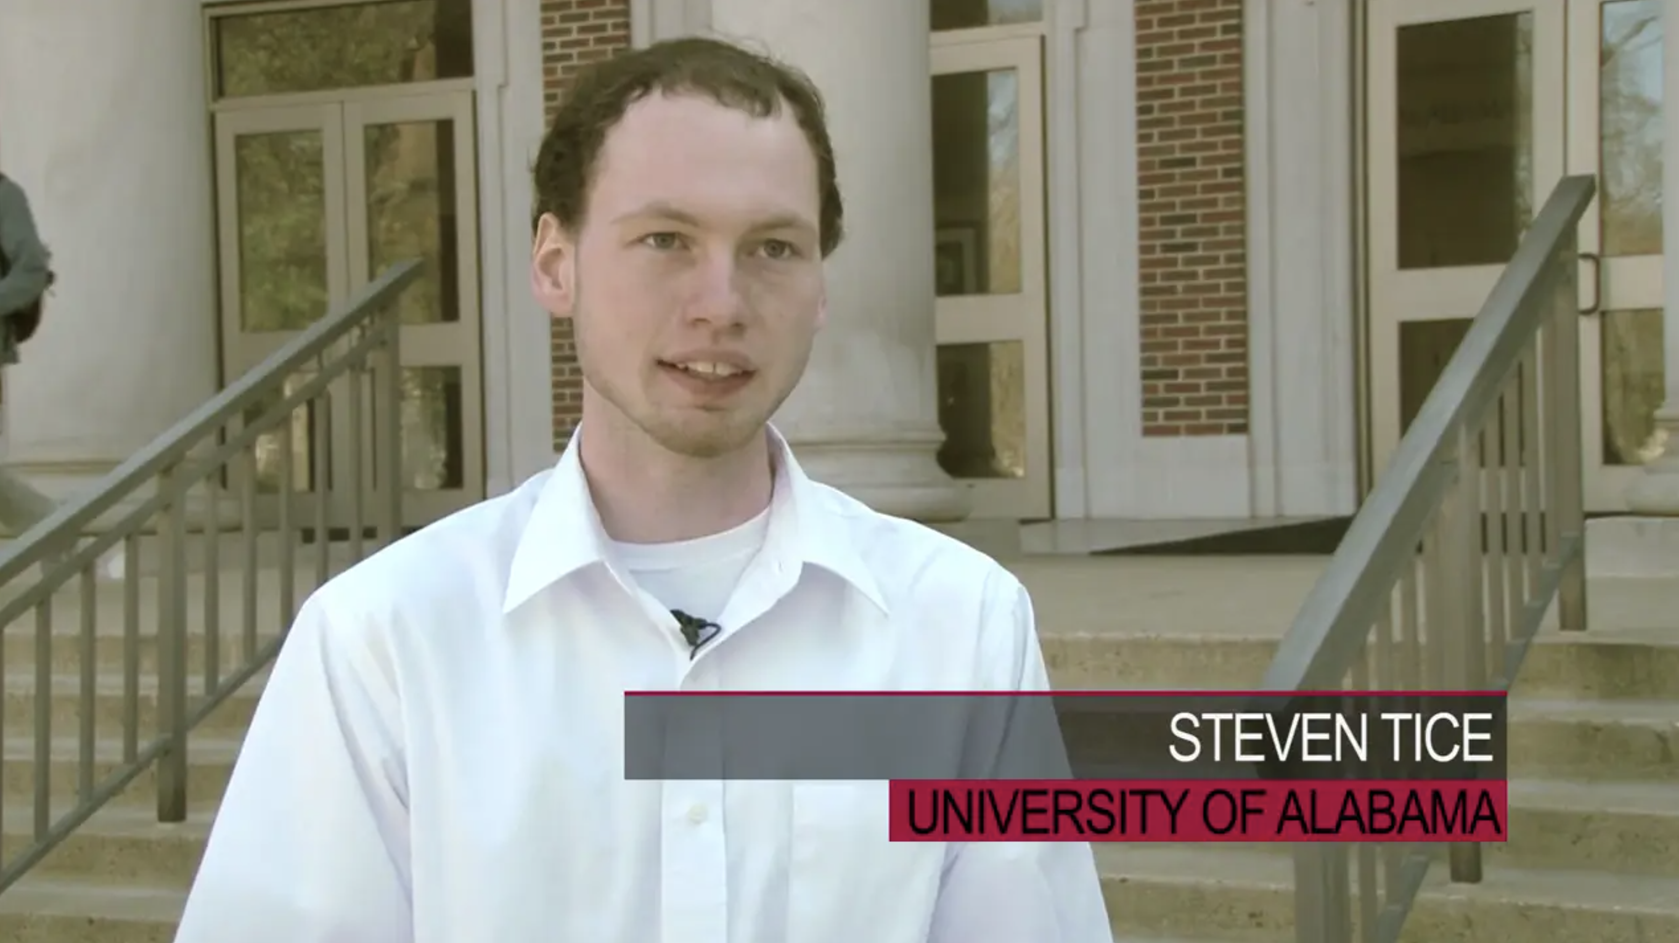 Steven Tice ('17), University of Alabama